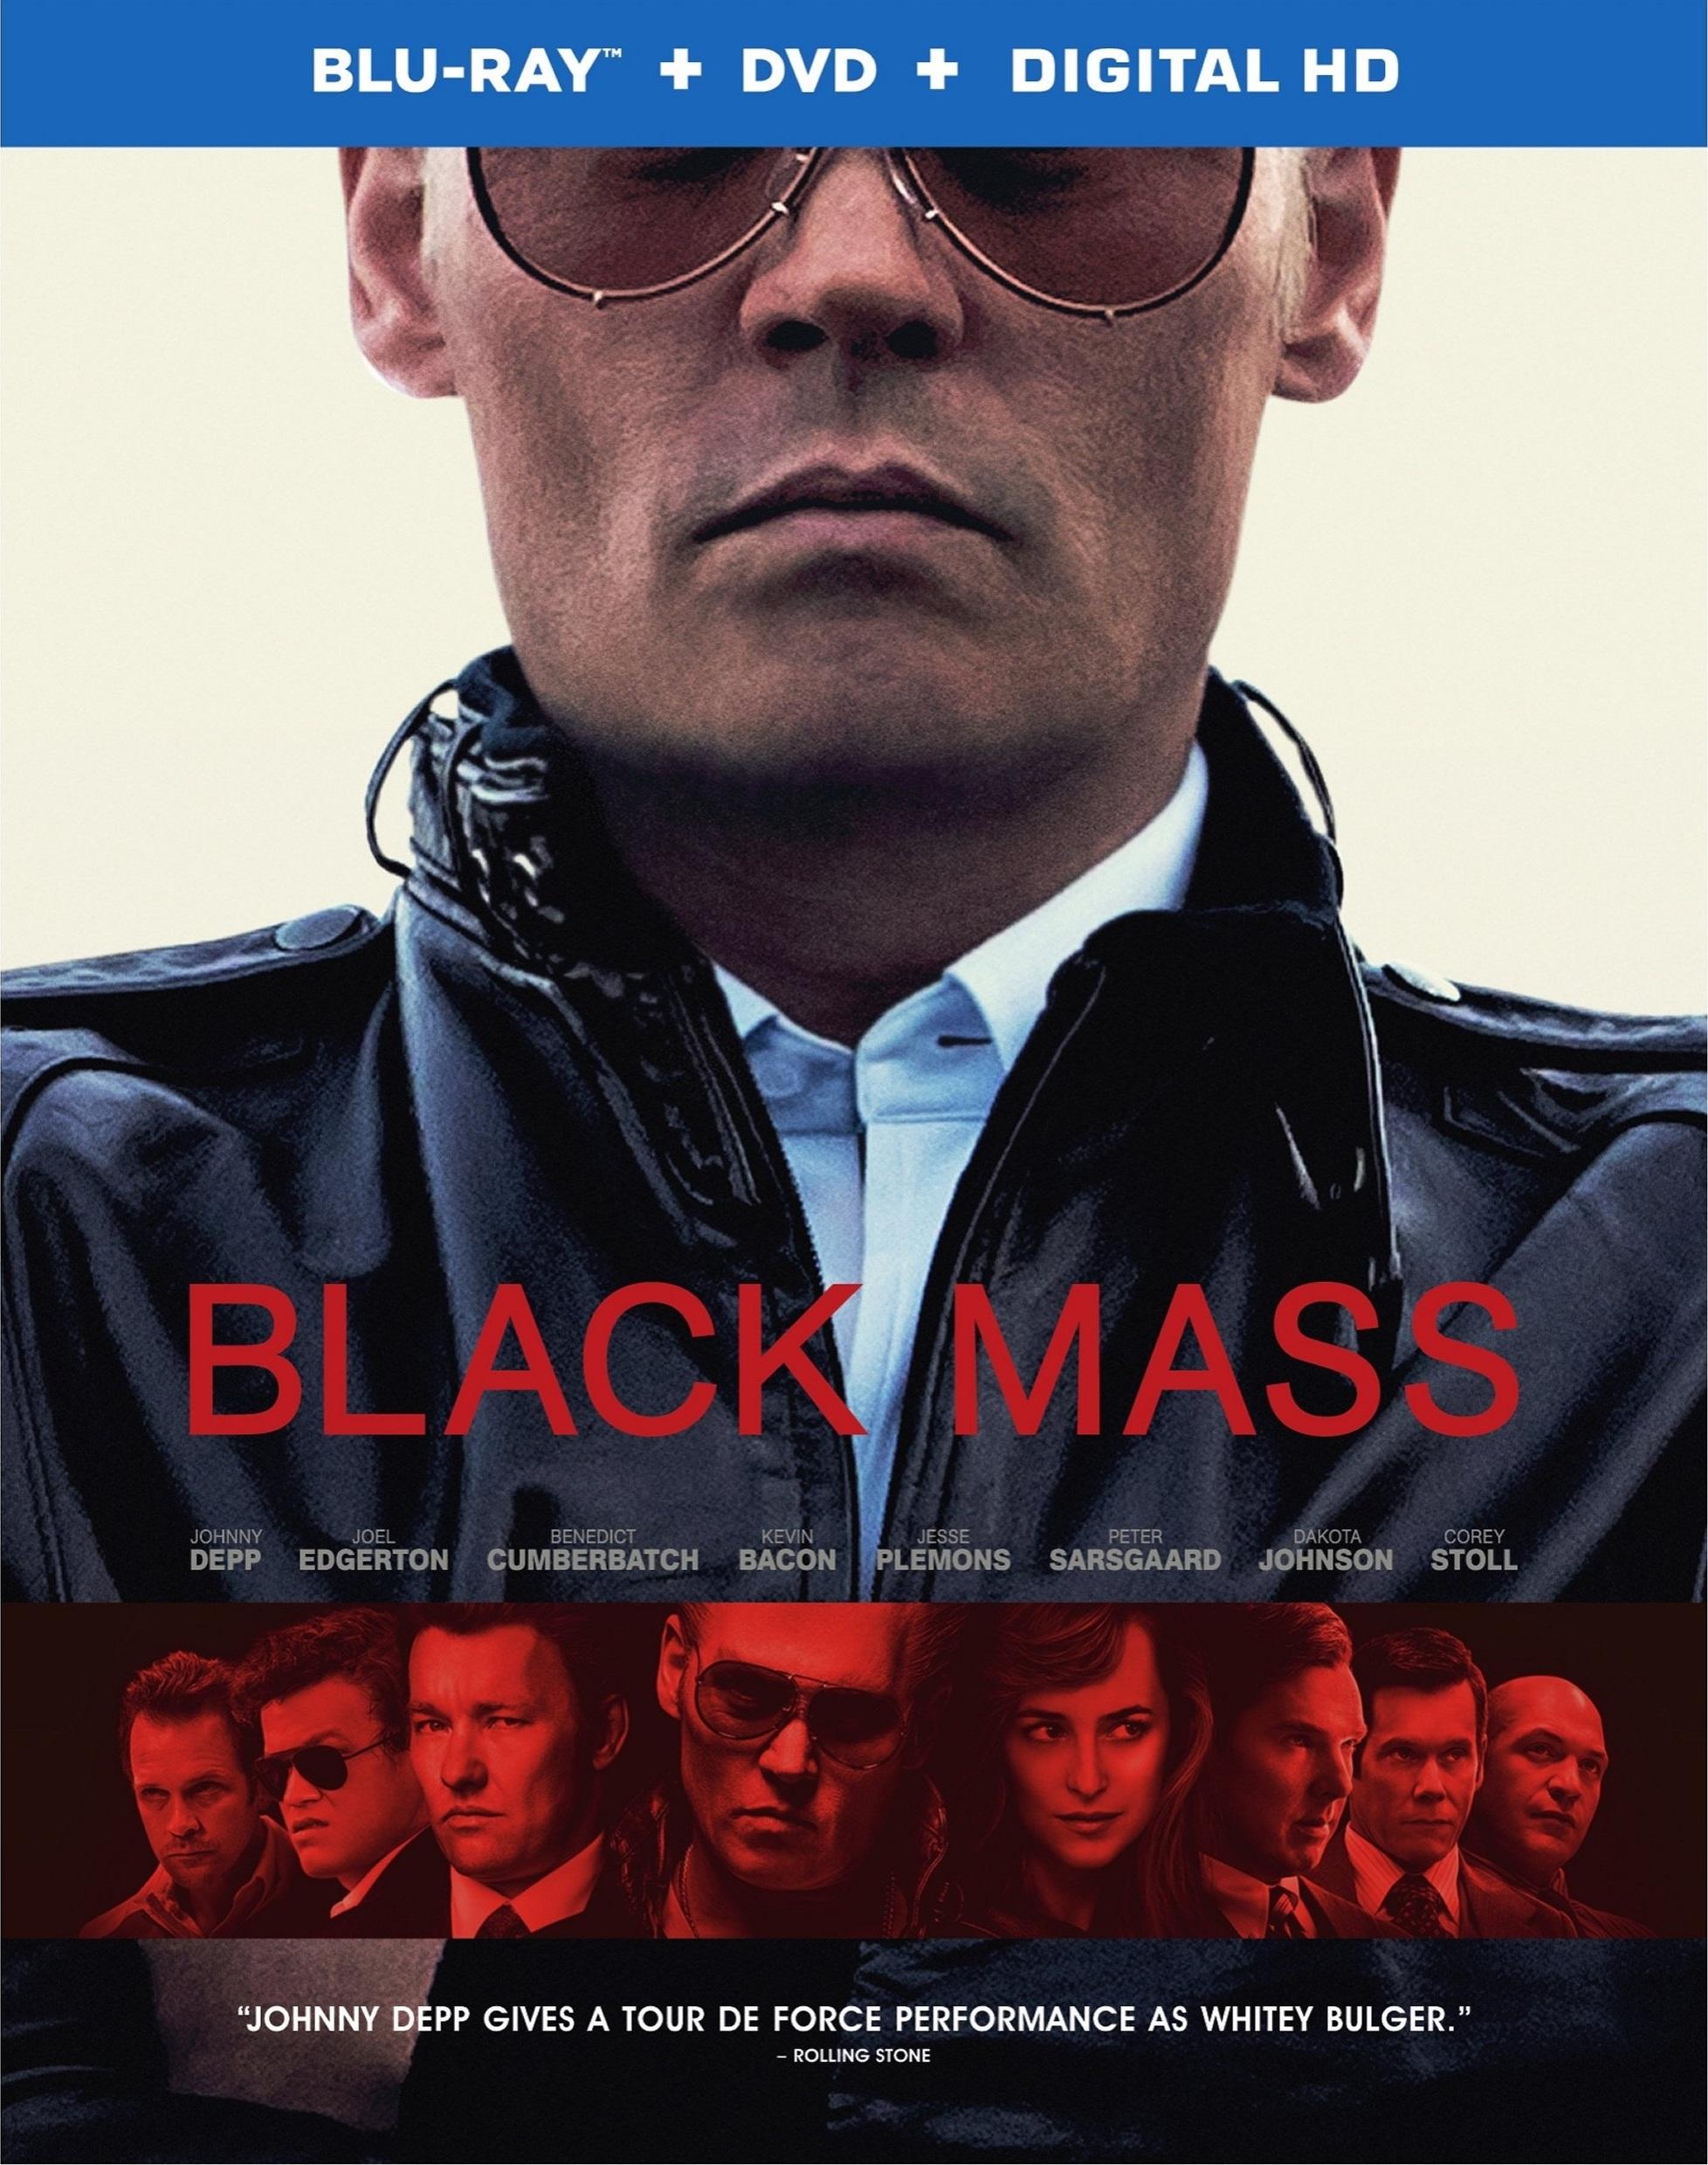 Black Mass (2015) poster image